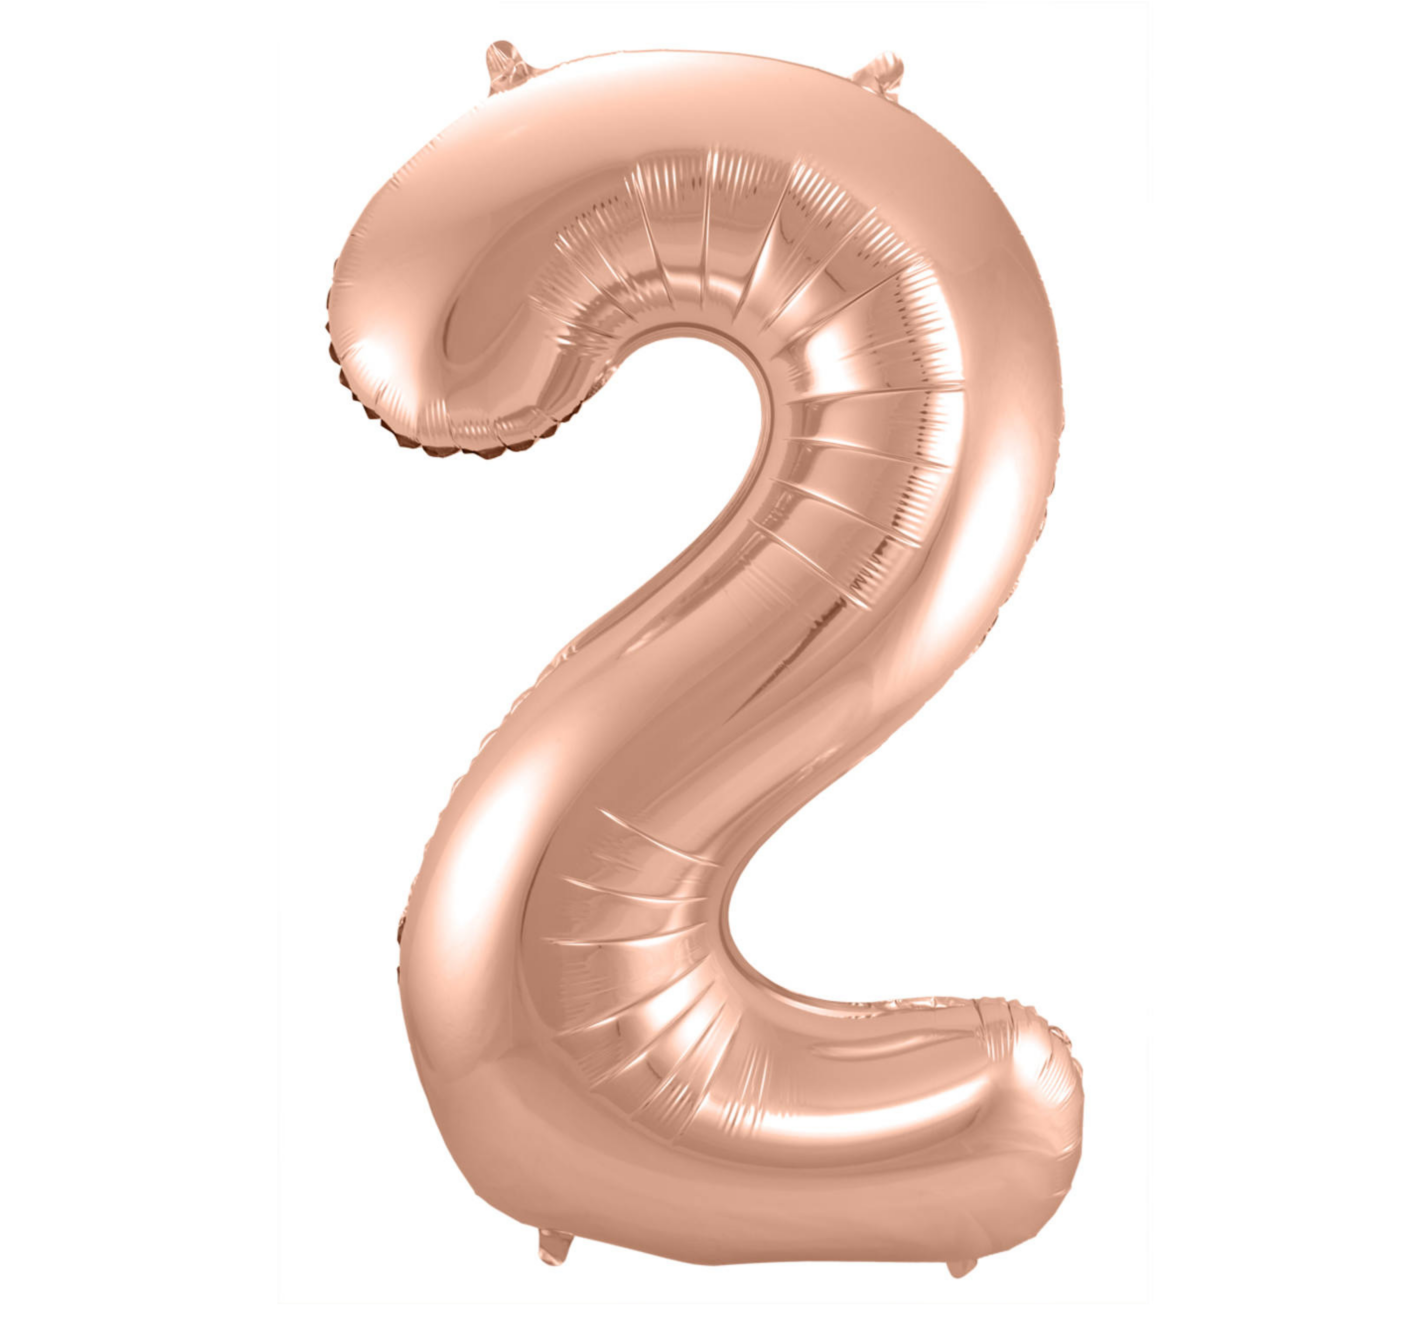 Folat Folieballon - Cijfer - 2 - Rosé goud - 86cm - Zonder vulling